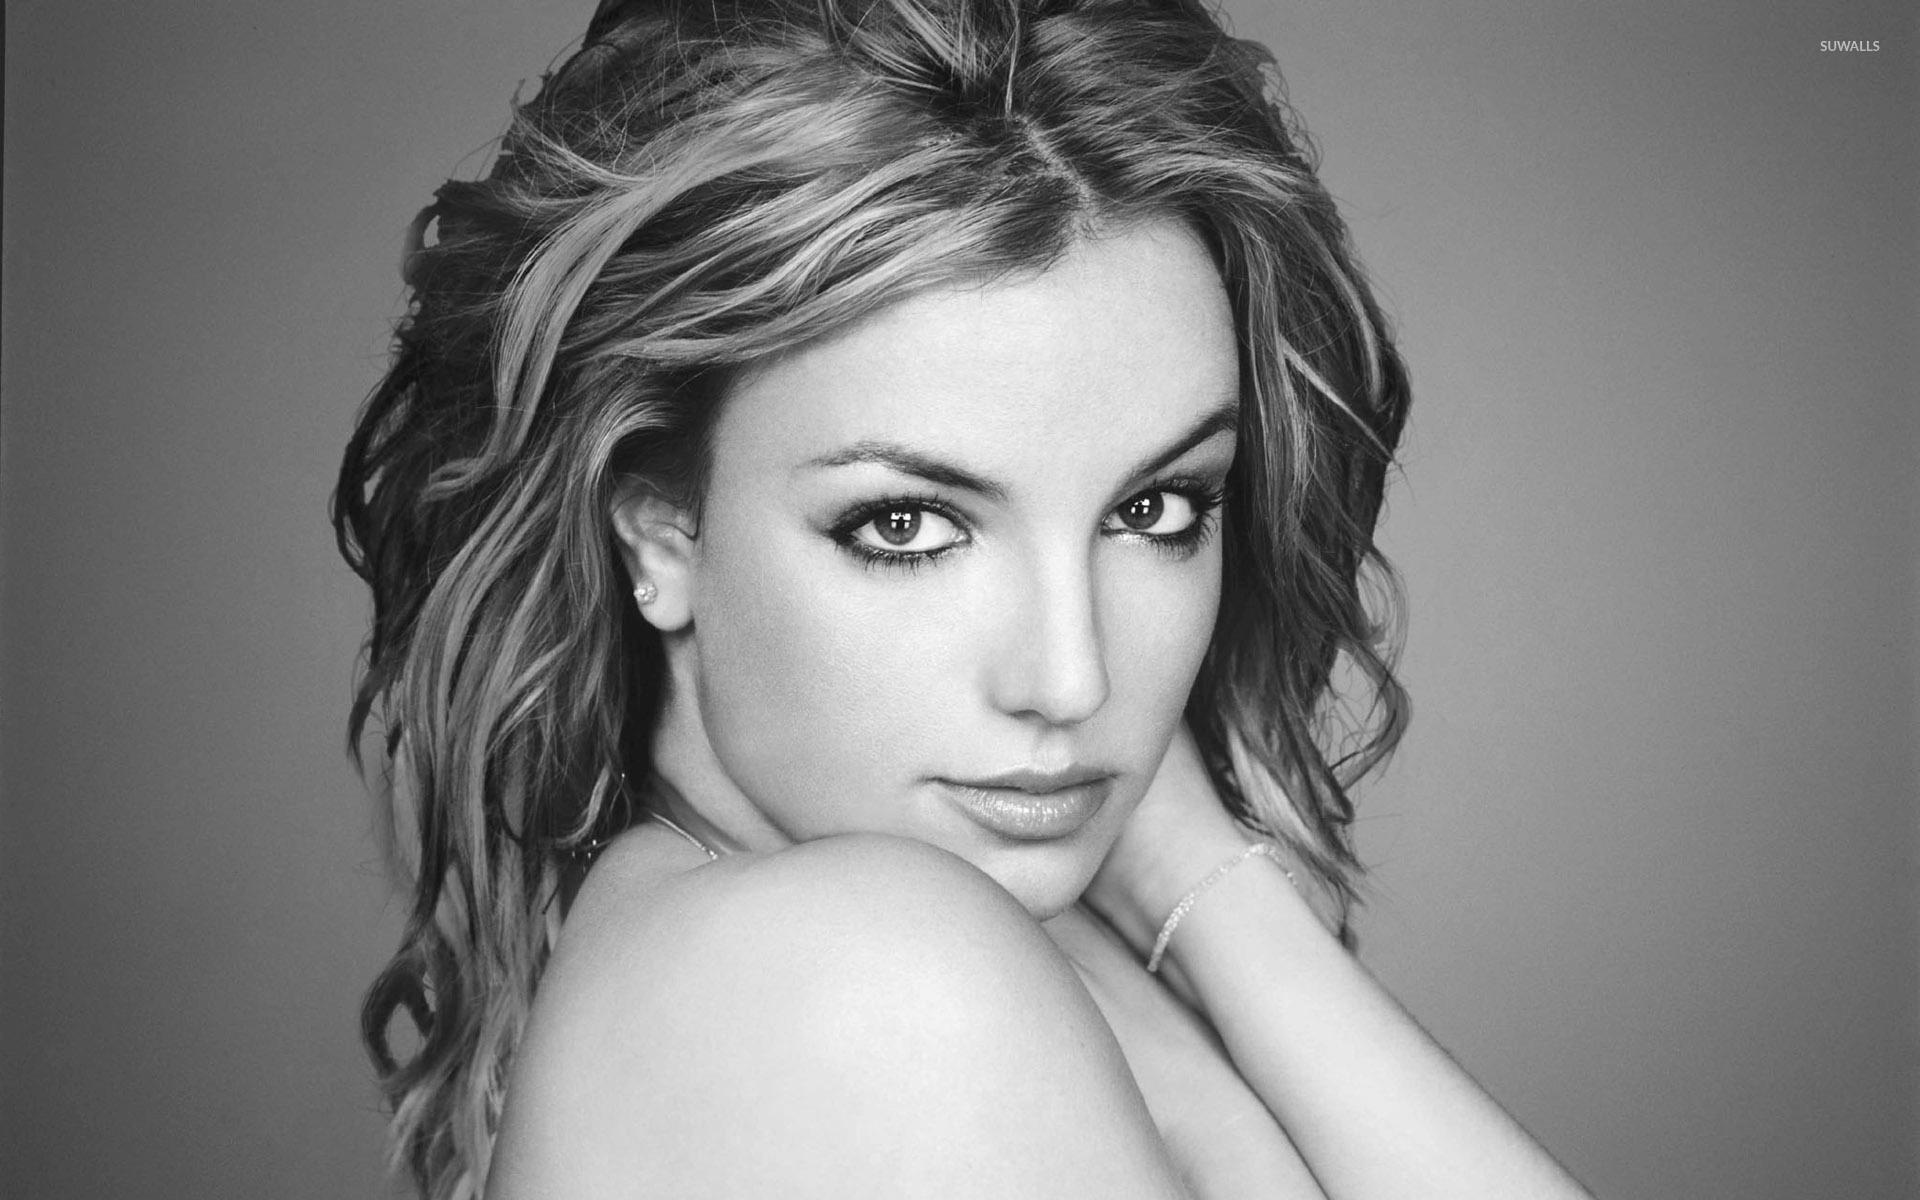 Britney Spears 19 Wallpaper Celebrity Wallpapers 37054